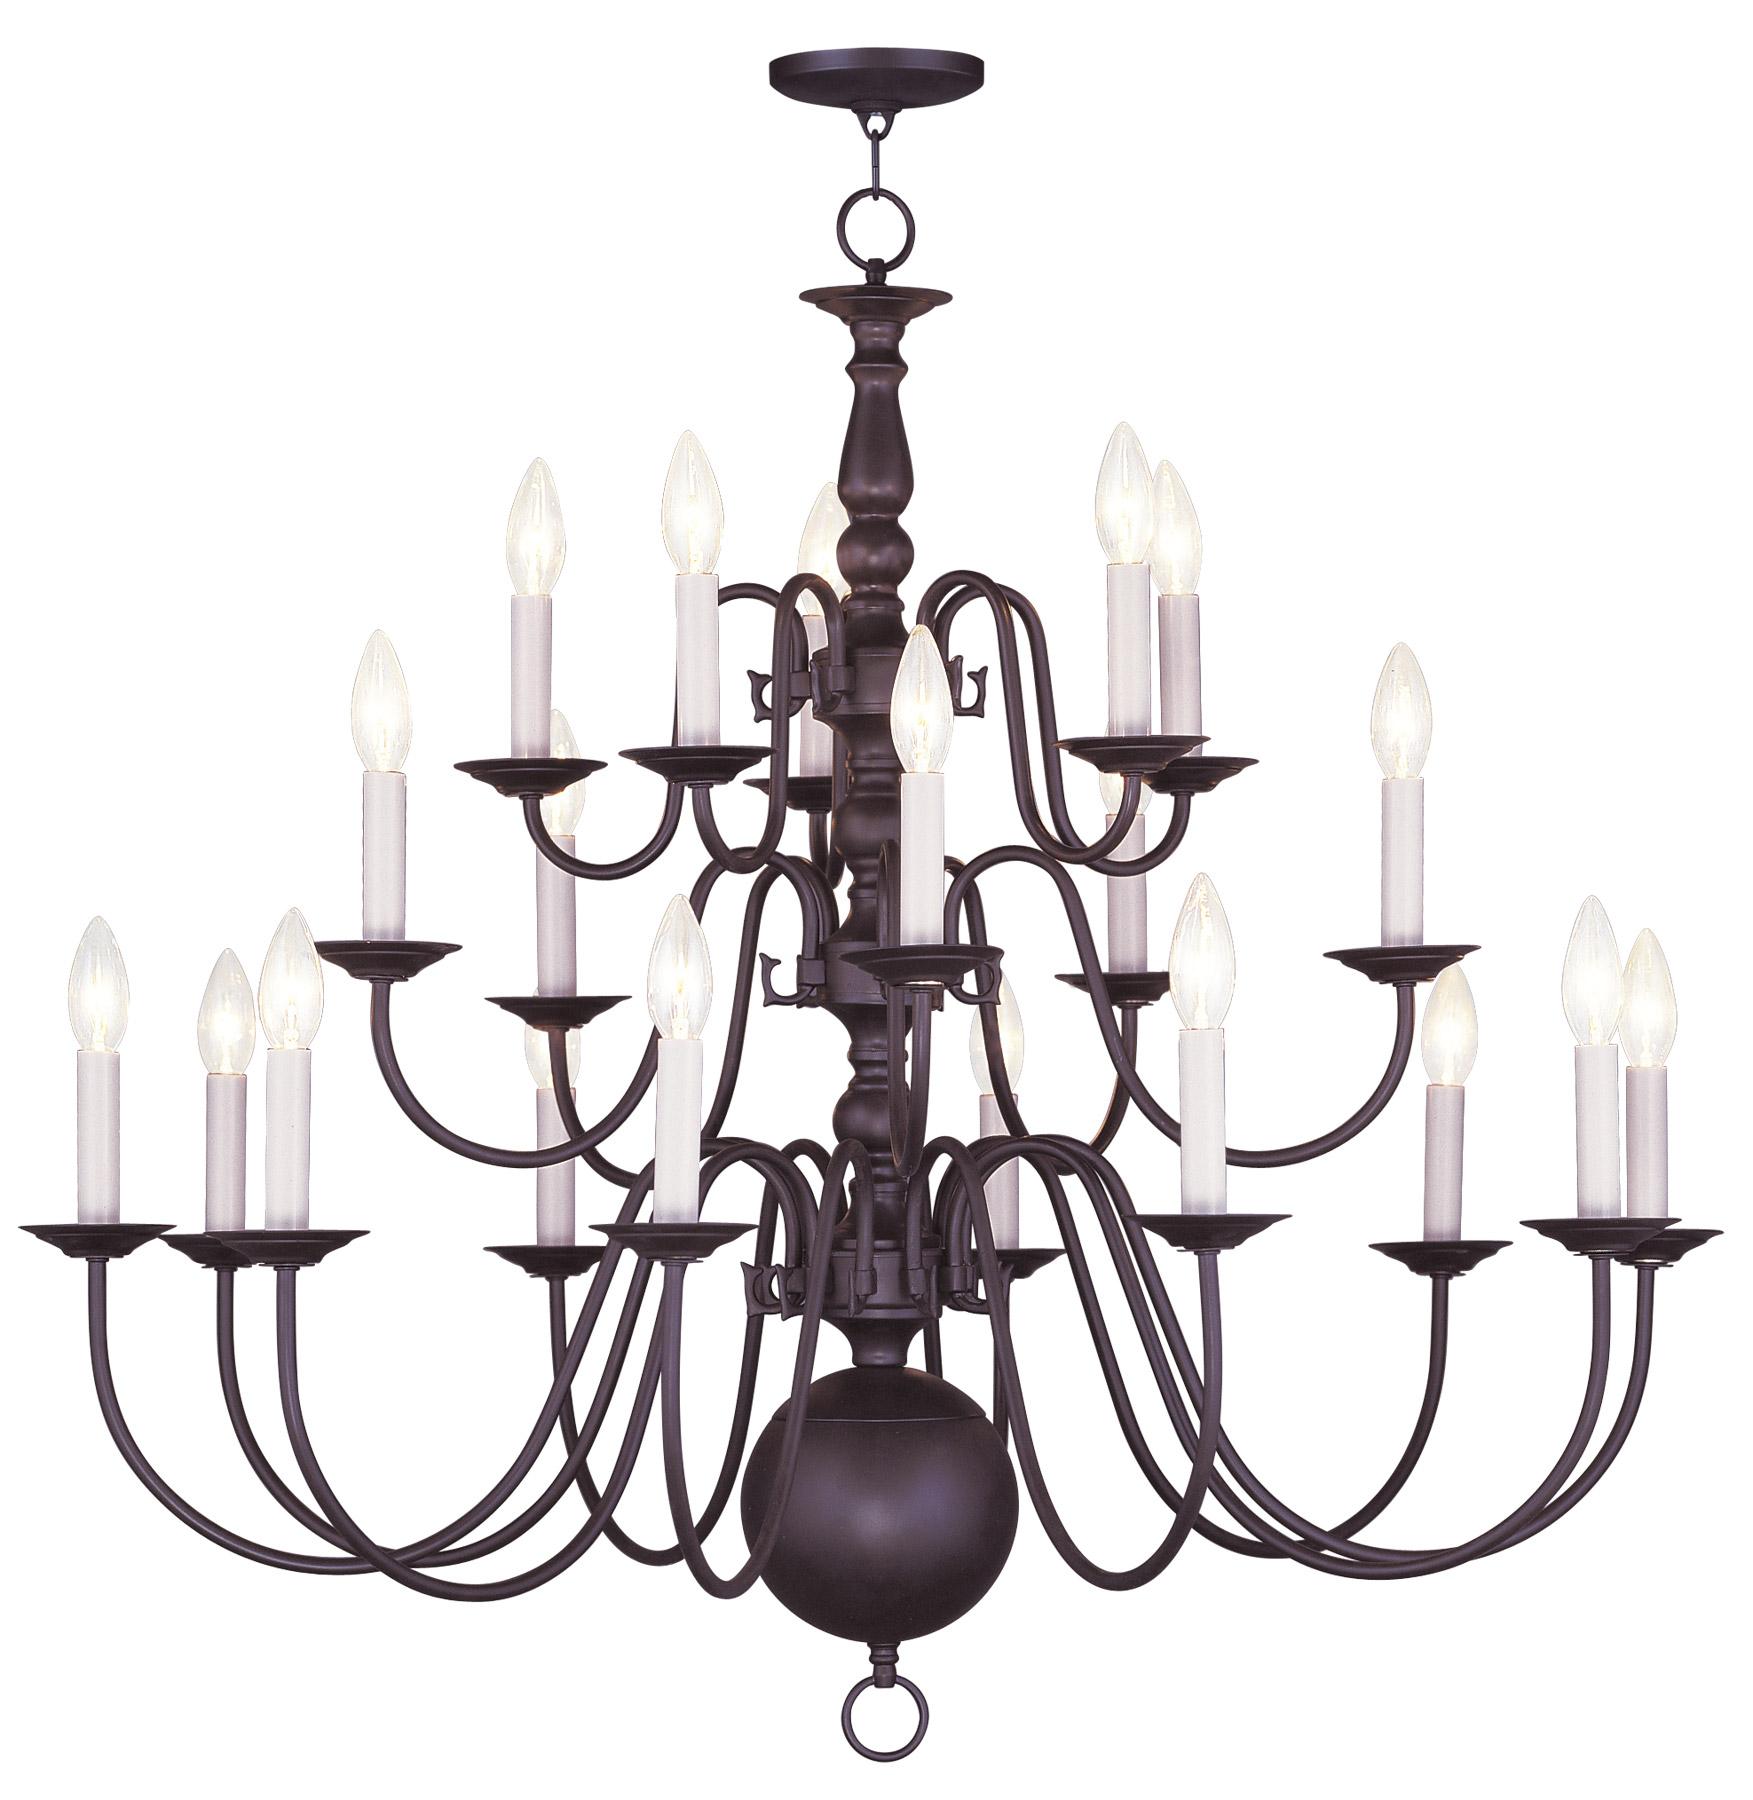 Livex lighting 5019 07 williamsburg twenty light chandelier aloadofball Image collections